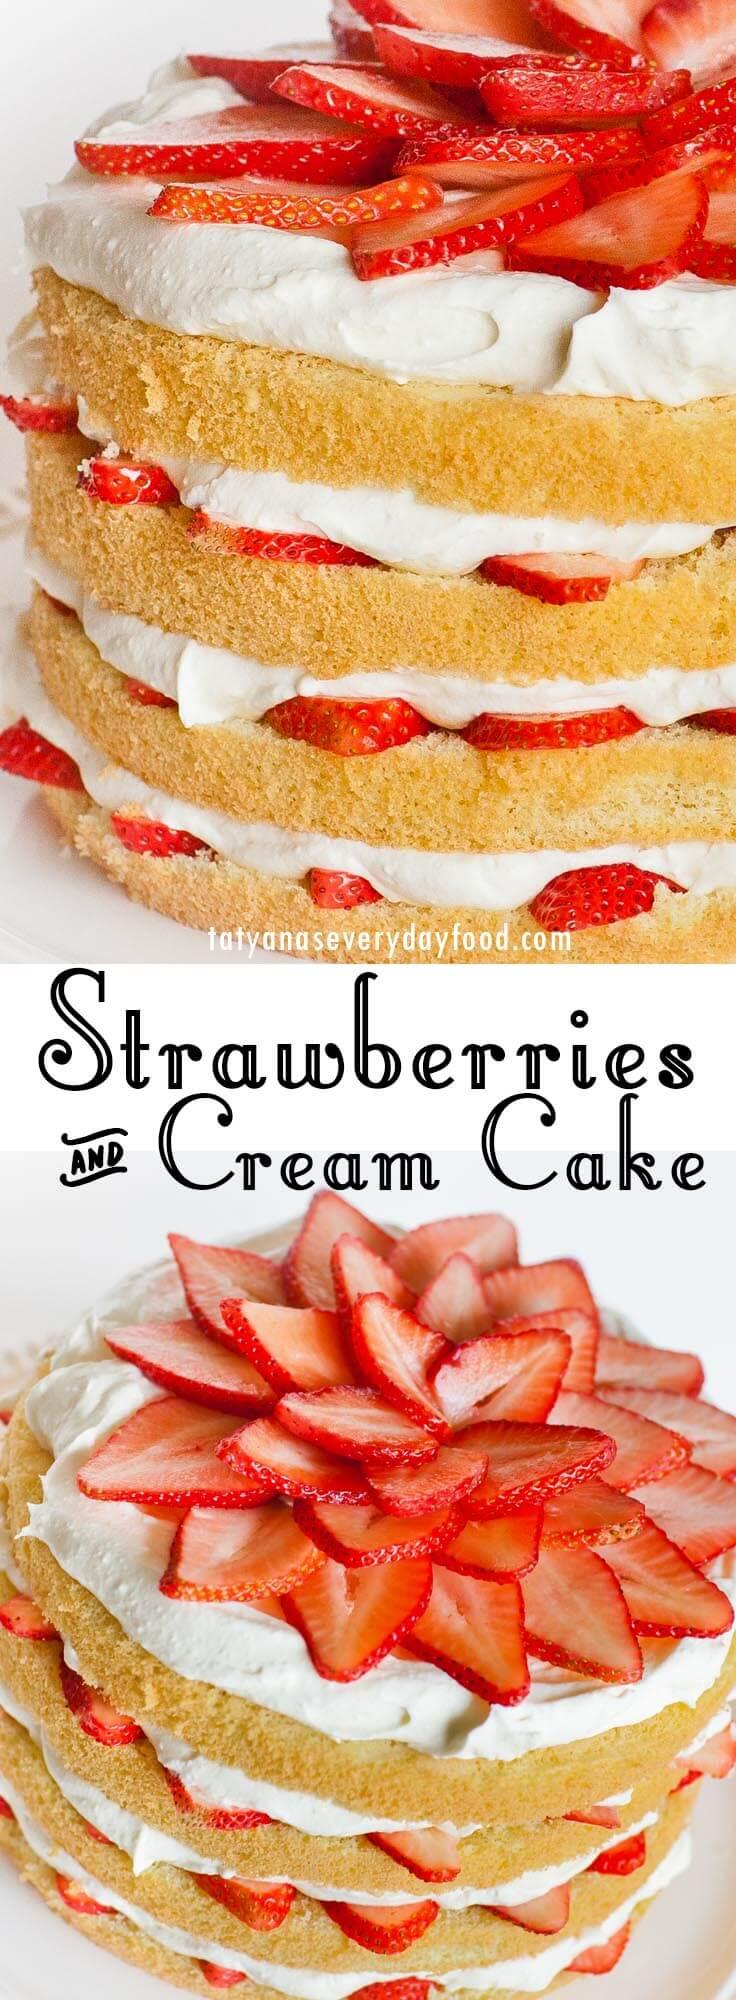 Strawberries & Cream Cake video recipe